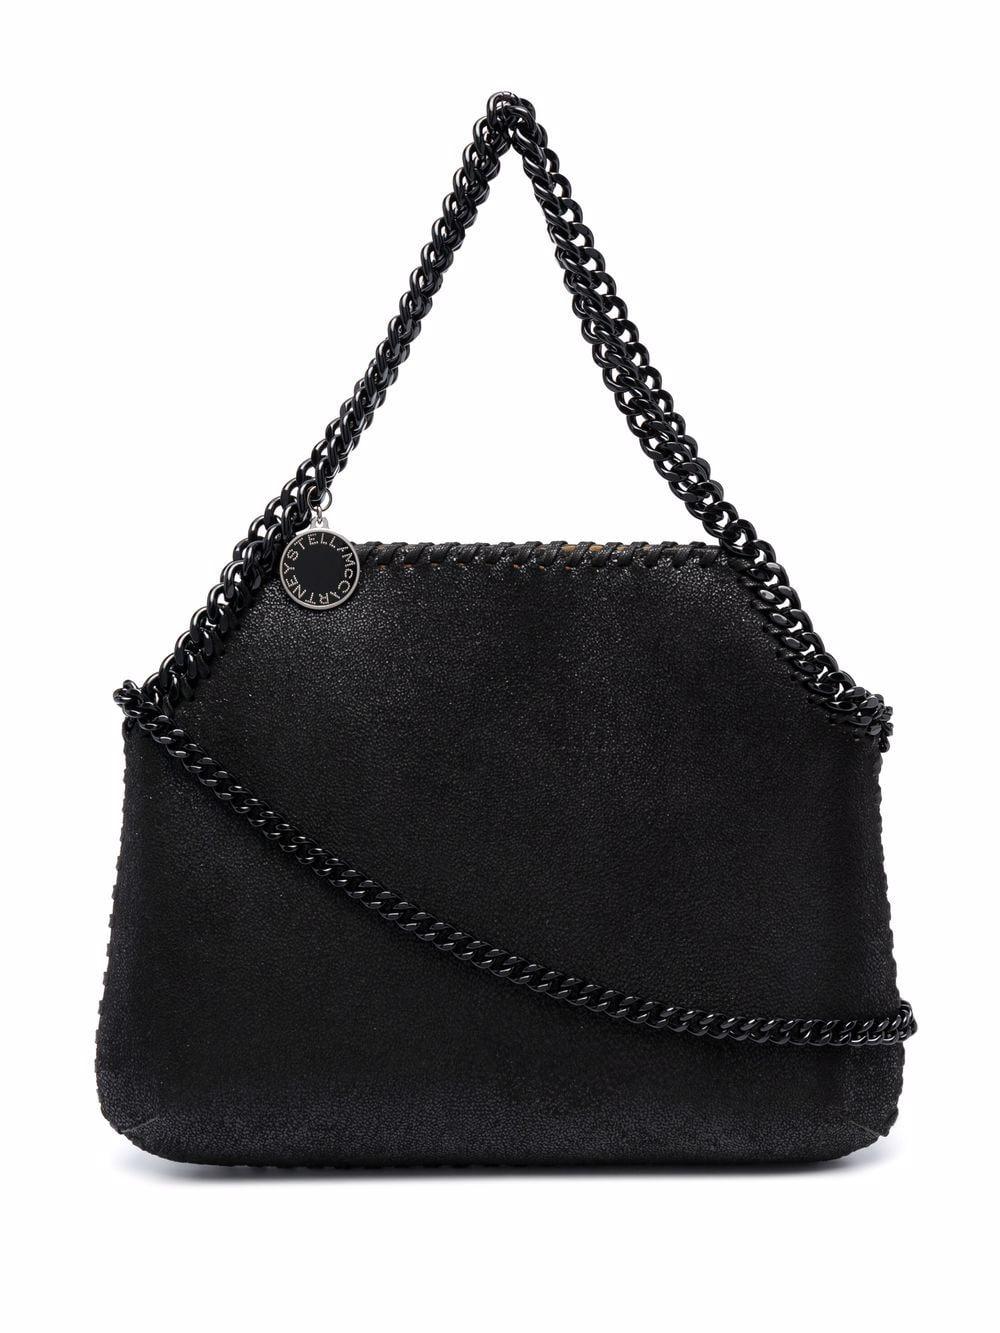 STELLA MCCARTNEY- Falabella Shoulder Bag- Woman- Uni - Black